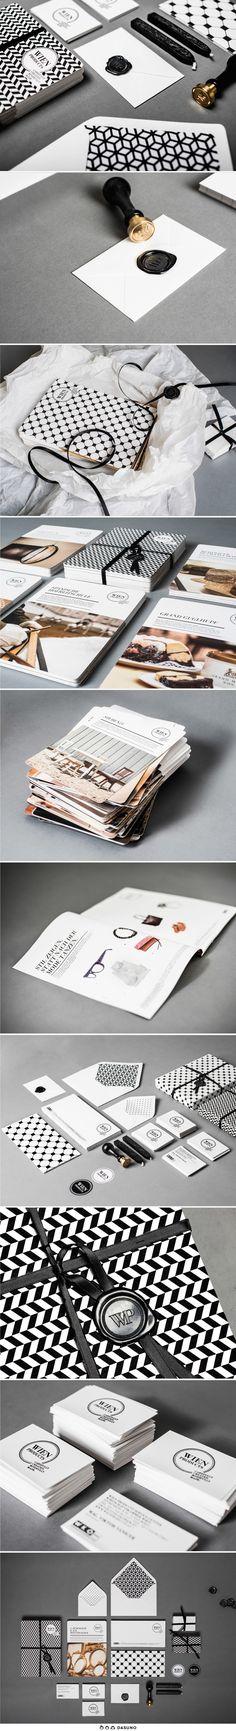 DASUNO // Client: Wien+Products // Corporate+Design // 2014 Corporate Design, Design Inspiration, Products, Brand Design, Gadget, Brand Identity Design